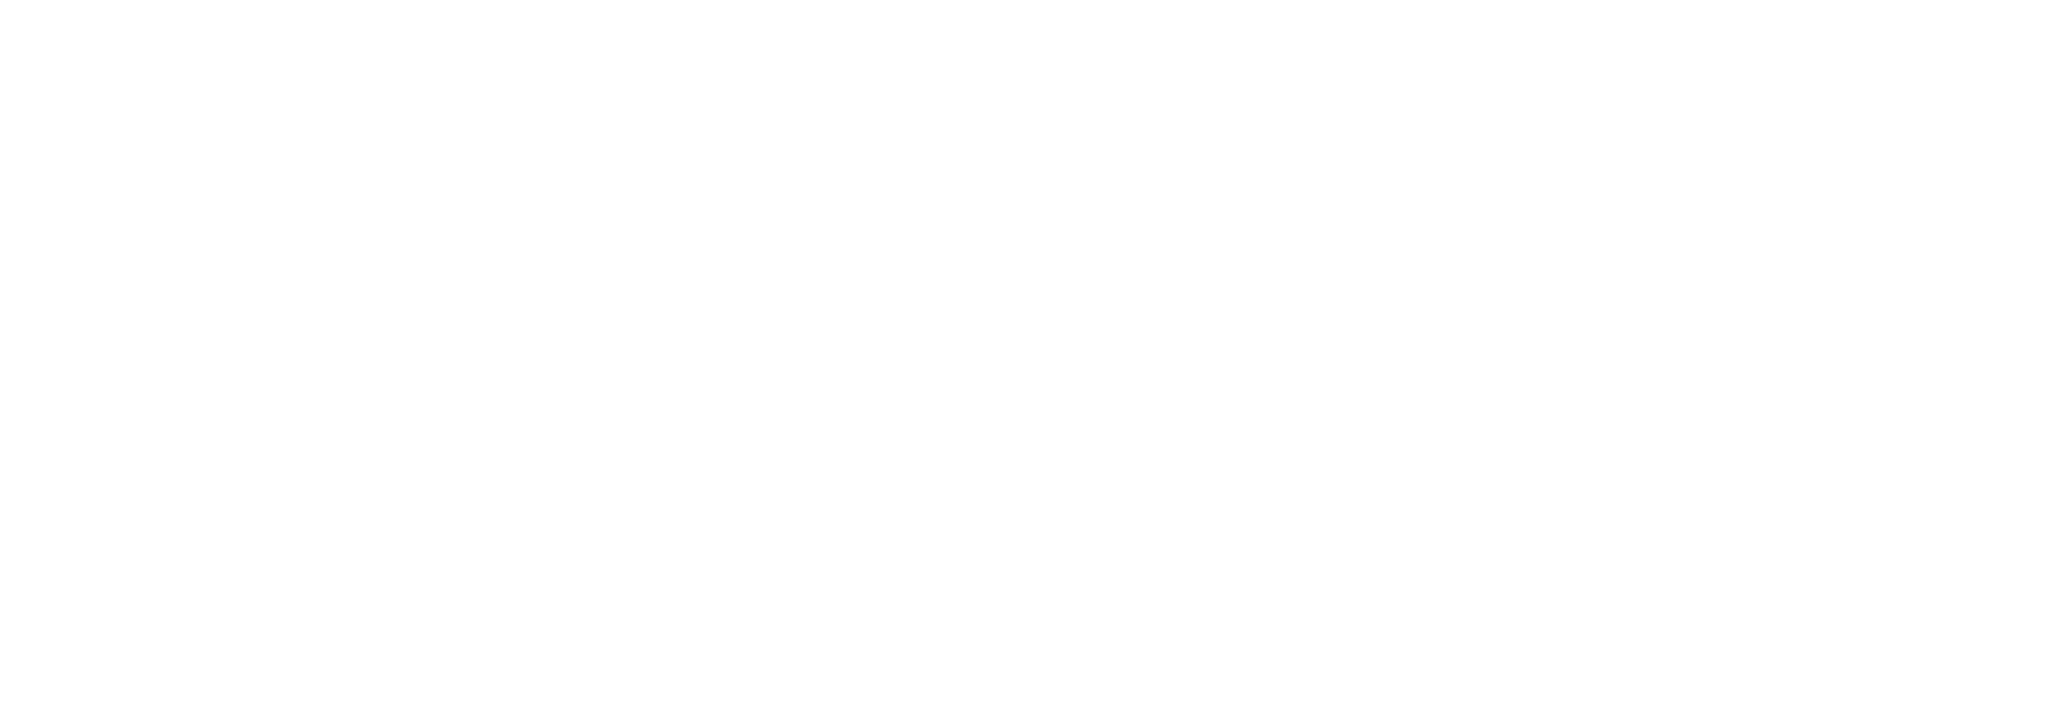 Studio More Case Study Nirvana Brewery Title